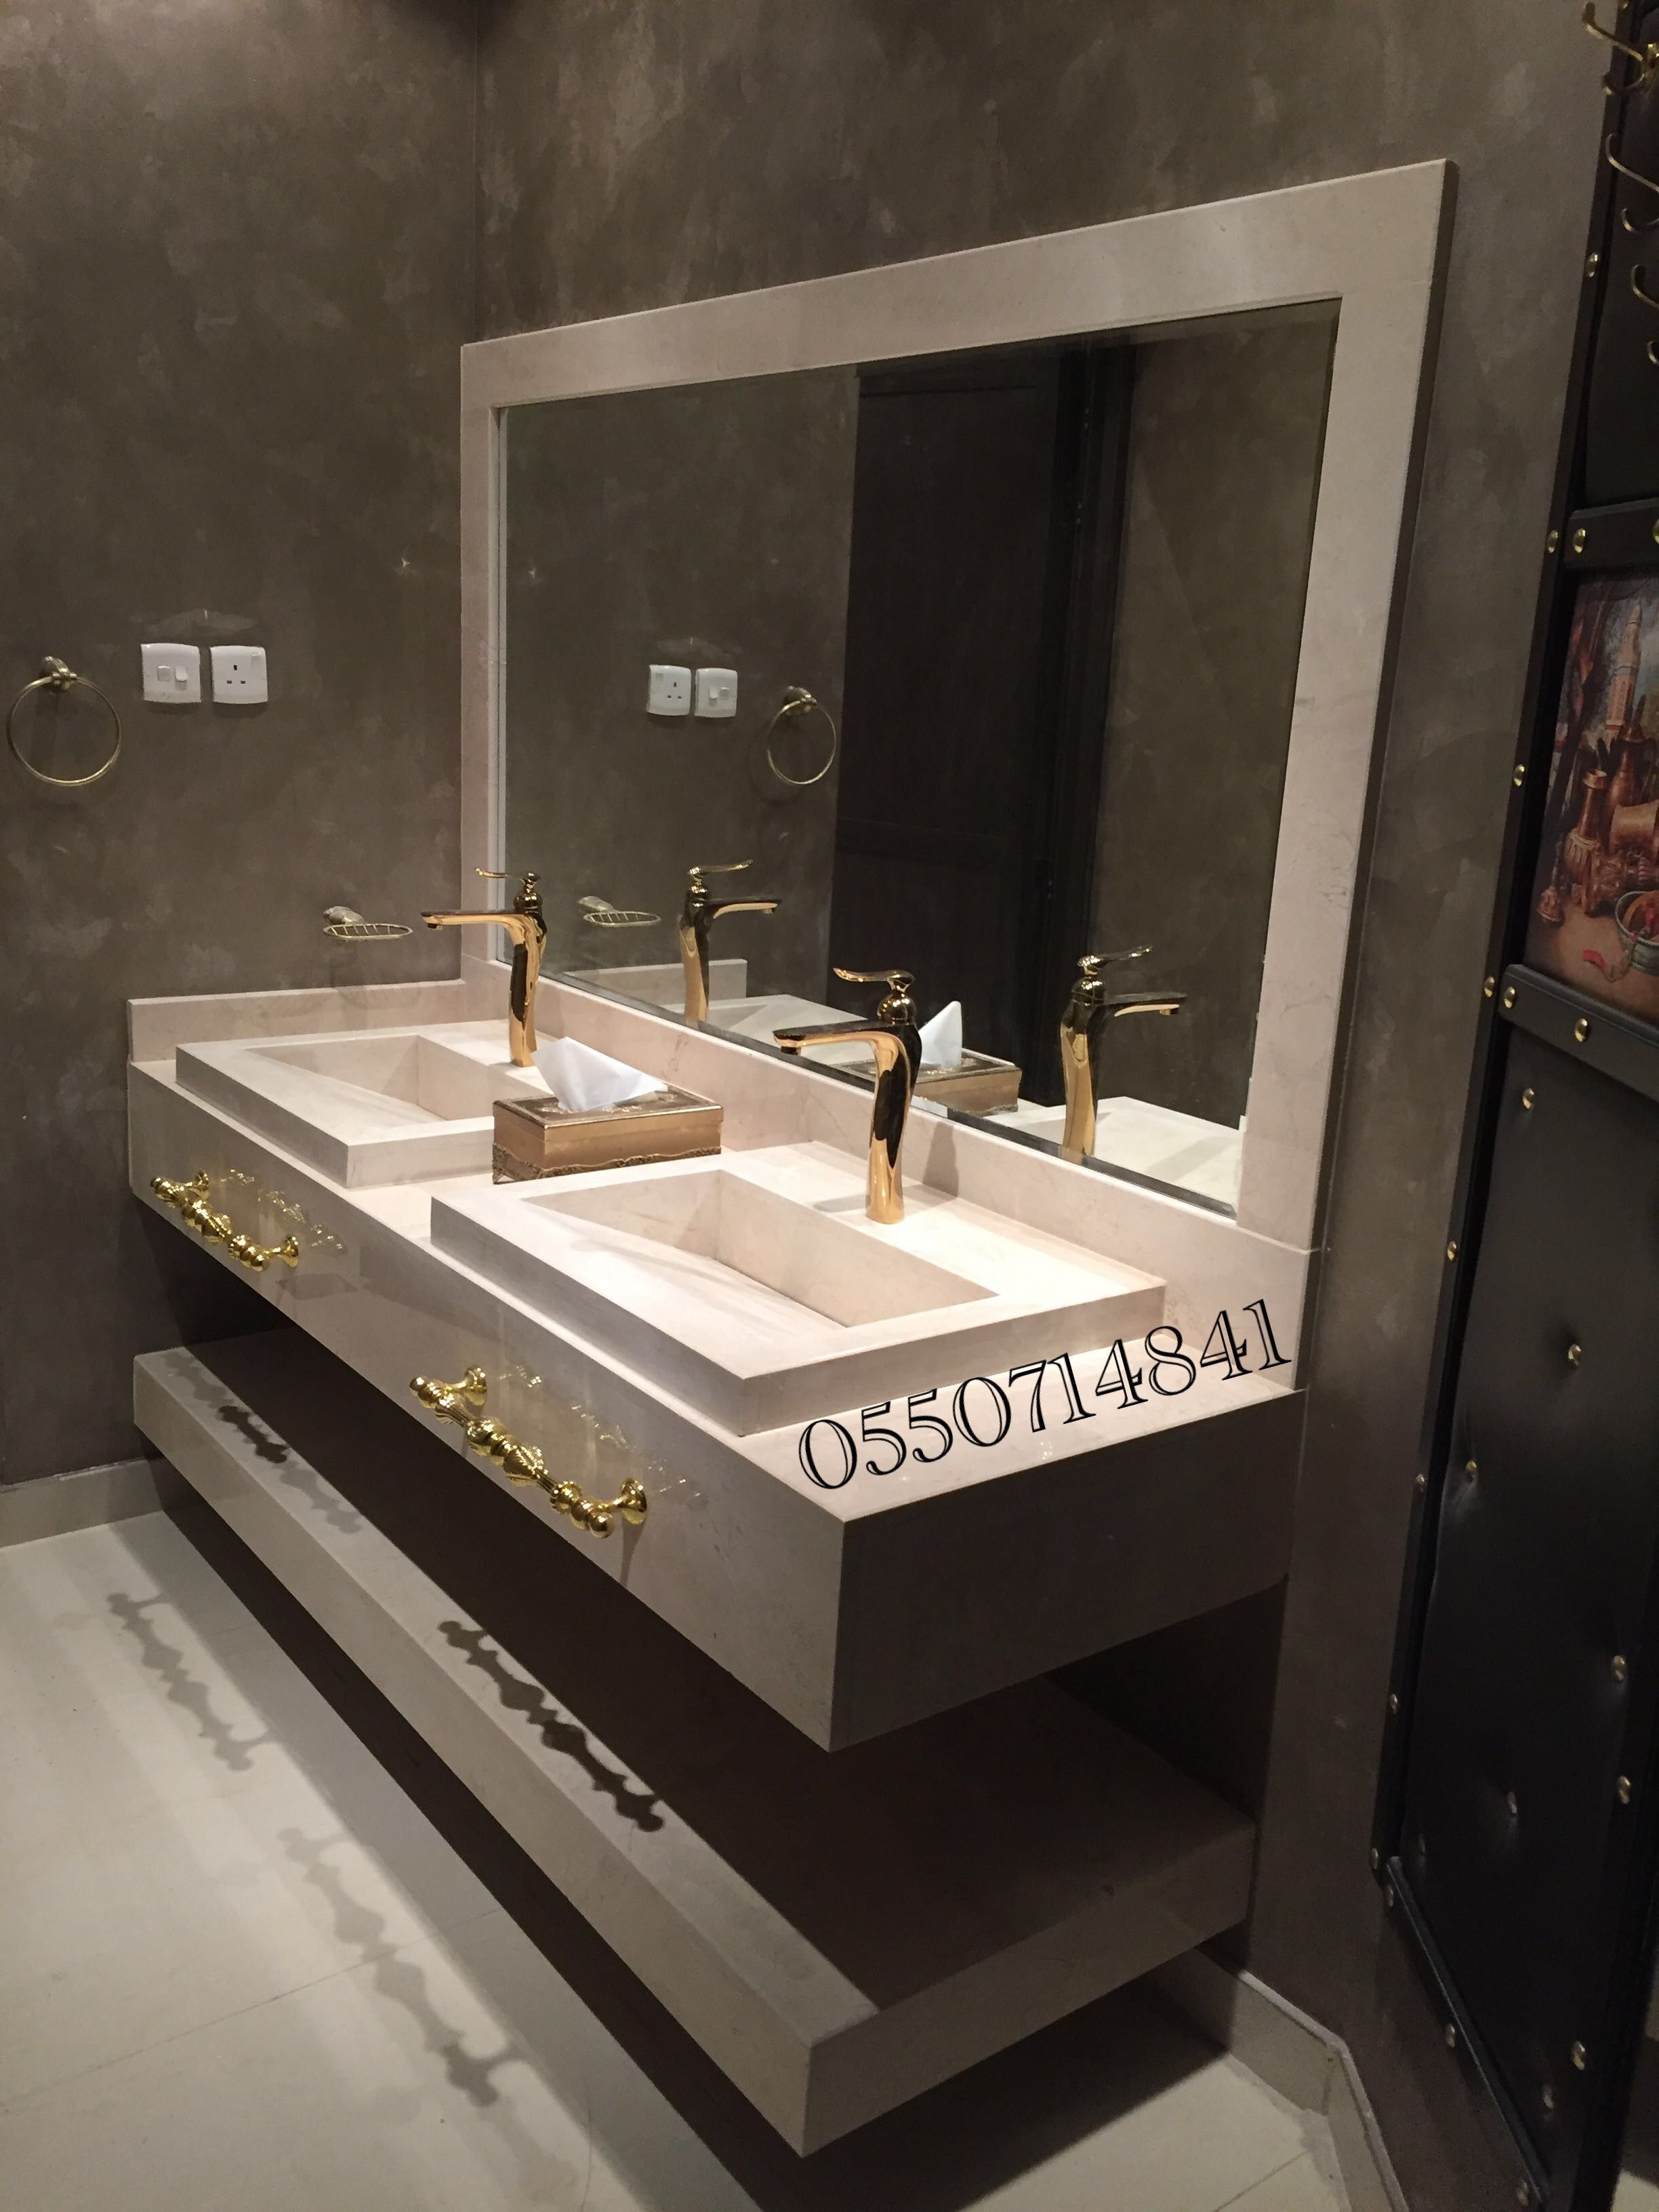 Pin By رخام طبيعي مغاسل درج أرضي On 0550714841 Bathroom Interior Bathroom Mirror House Design